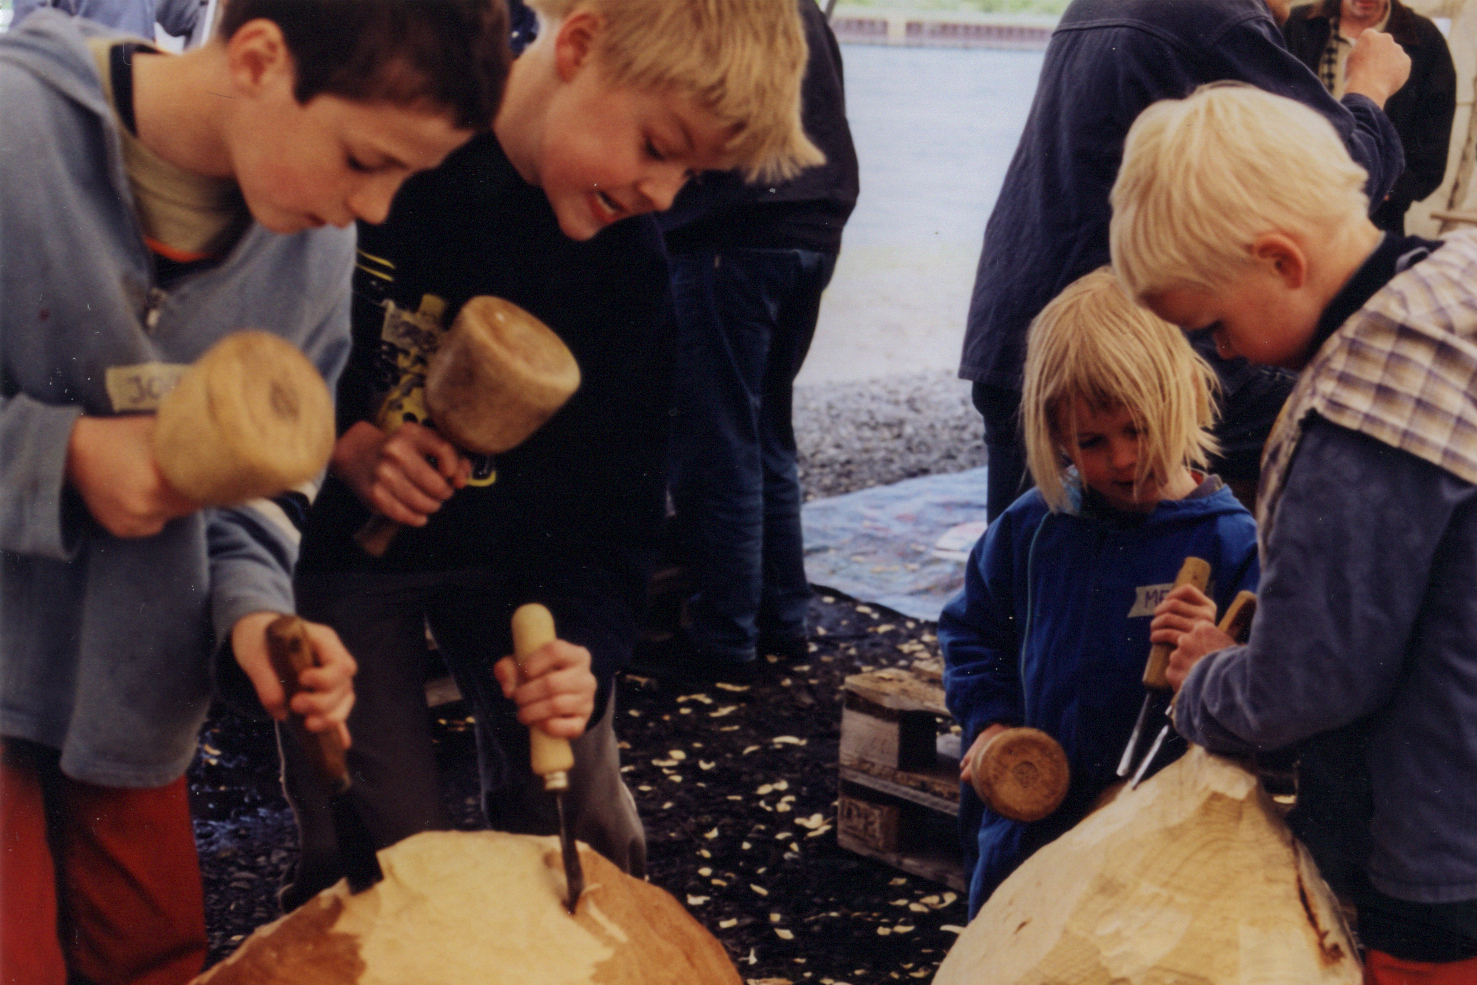 Kugelfische Aktion Bergkamen - teil 2 - bearbeitet.jpg